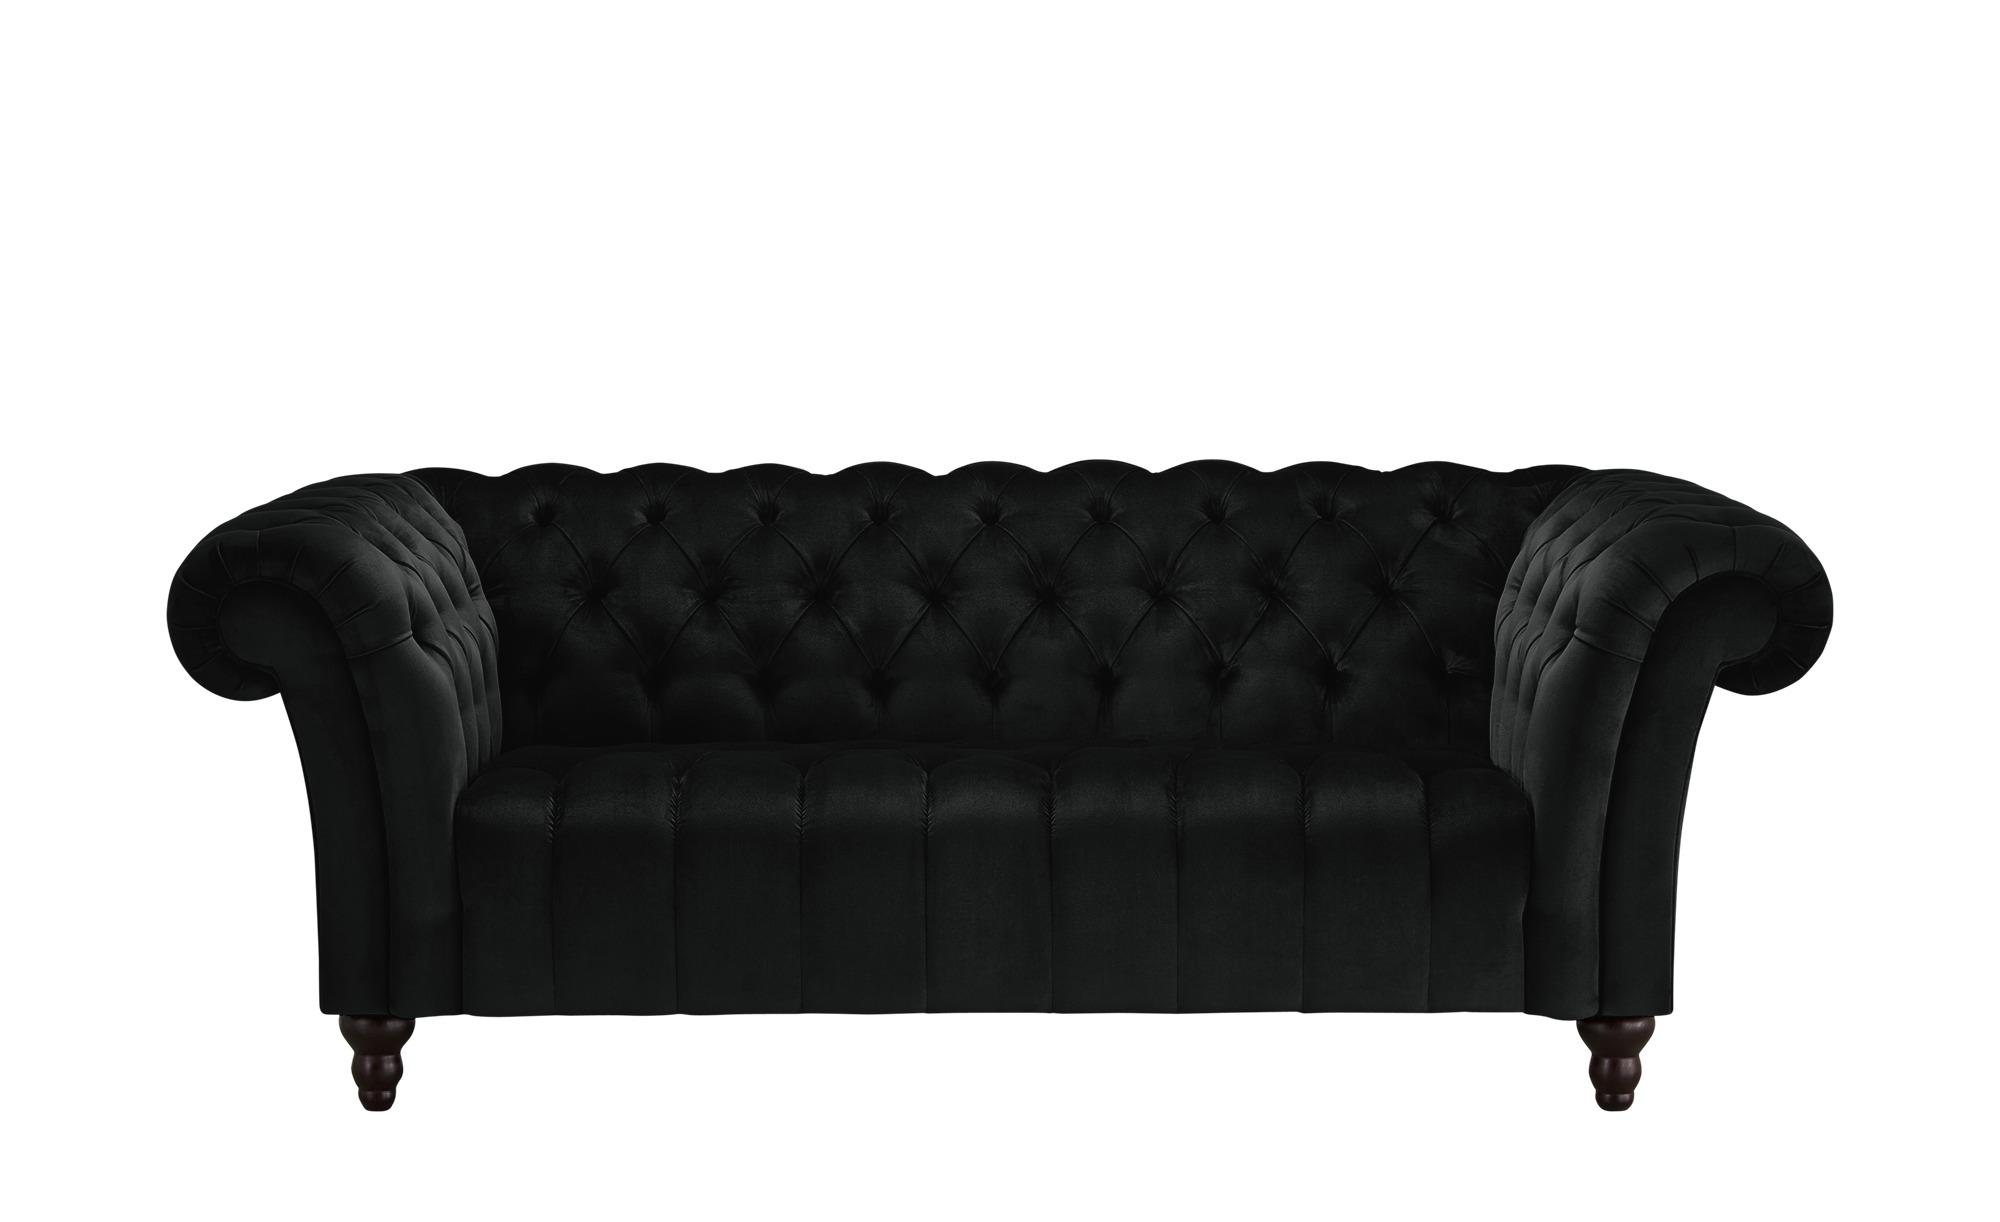 sofa 2 sitzig canyon schwarz ma e cm b 205 h 74 t 101 polsterm bel sofas 2 sitzer. Black Bedroom Furniture Sets. Home Design Ideas